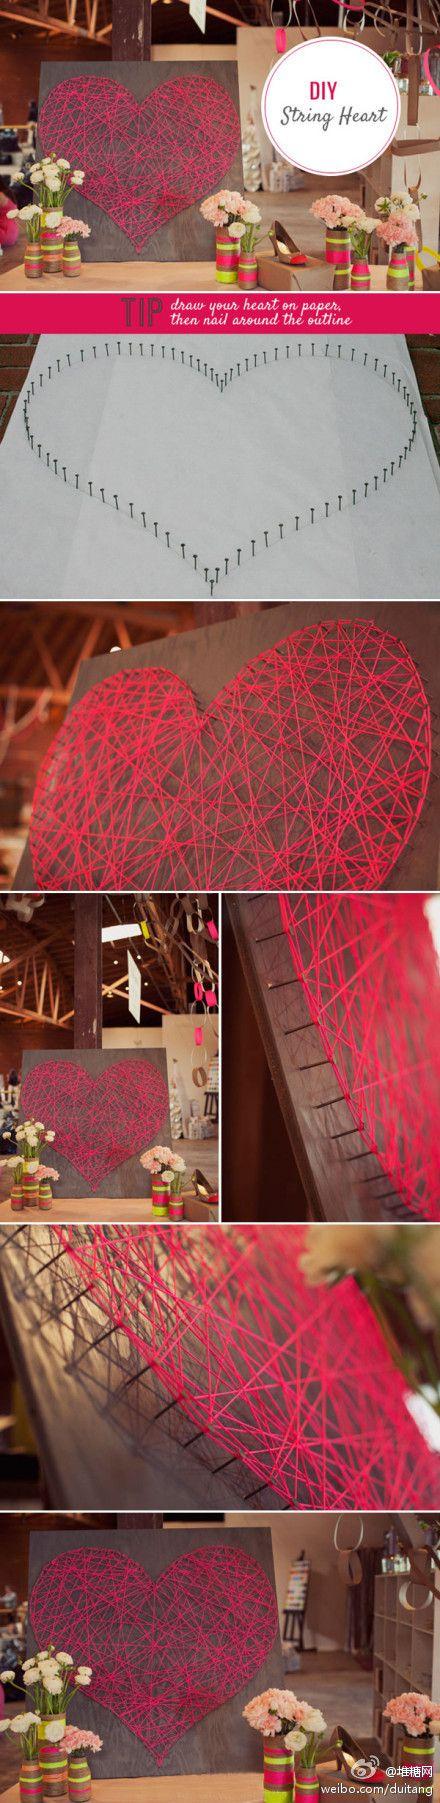 DIY string heart make it a photo holder, add black and white photos, christmas idea!!Wall Art, Ideas, String Heart, Valentine Day, Heart Art, String Art, Stringart, Diy, Crafts